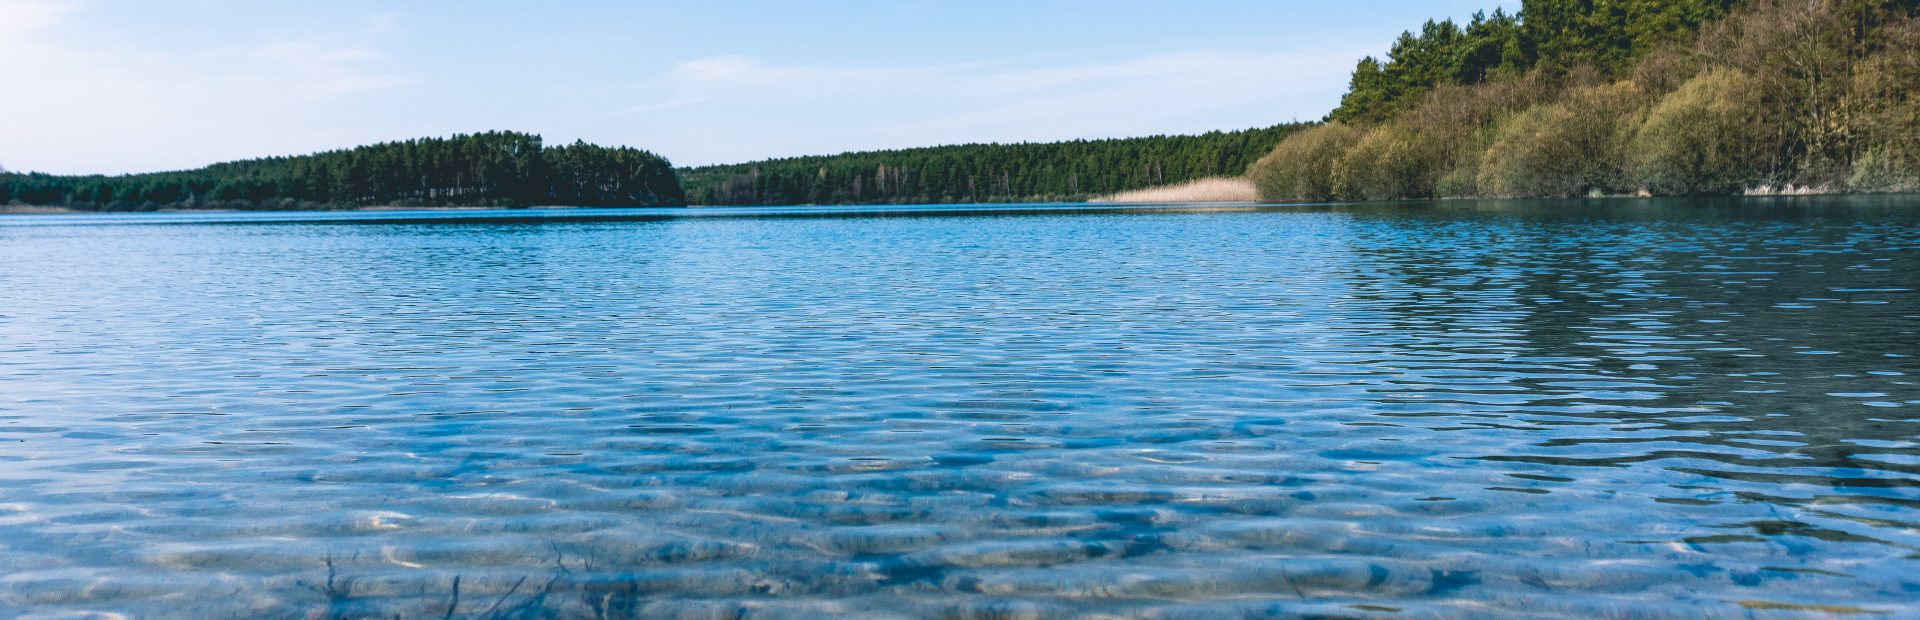 olpuch jezioro chadzie